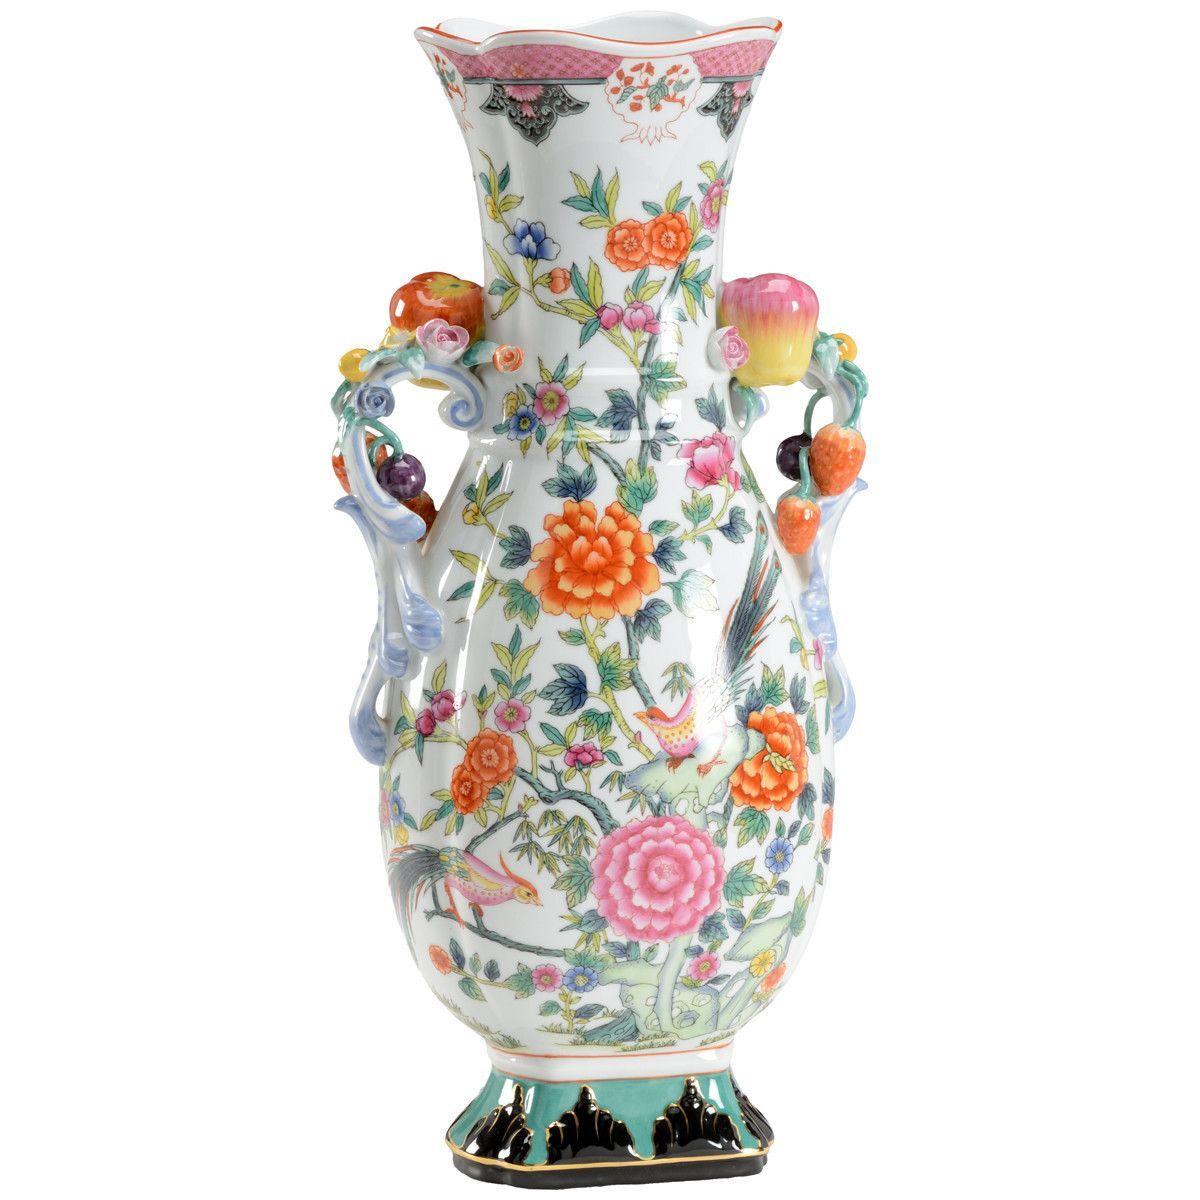 Chelsea House Chinese Porcelain Vase